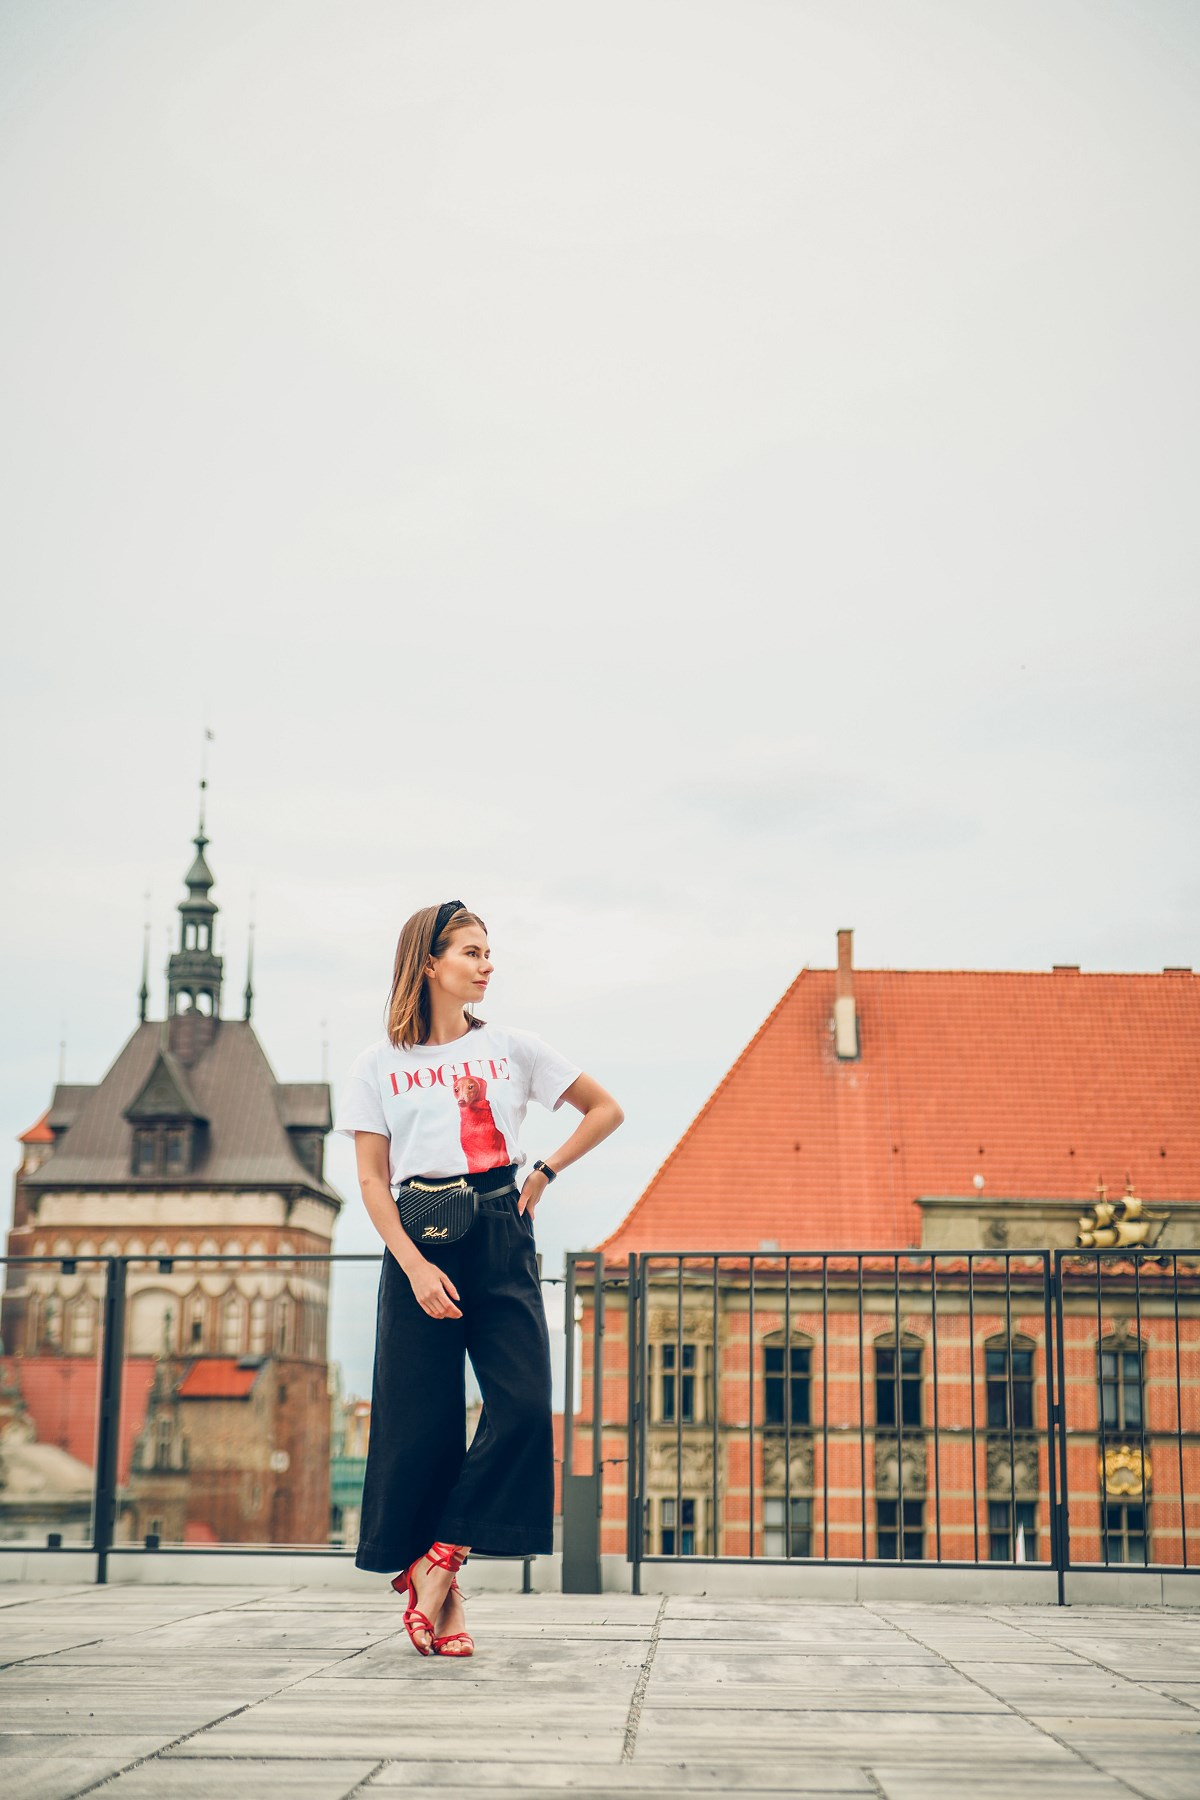 tshirt dogue culottes kuloty czerwone sandaly forum gdansk